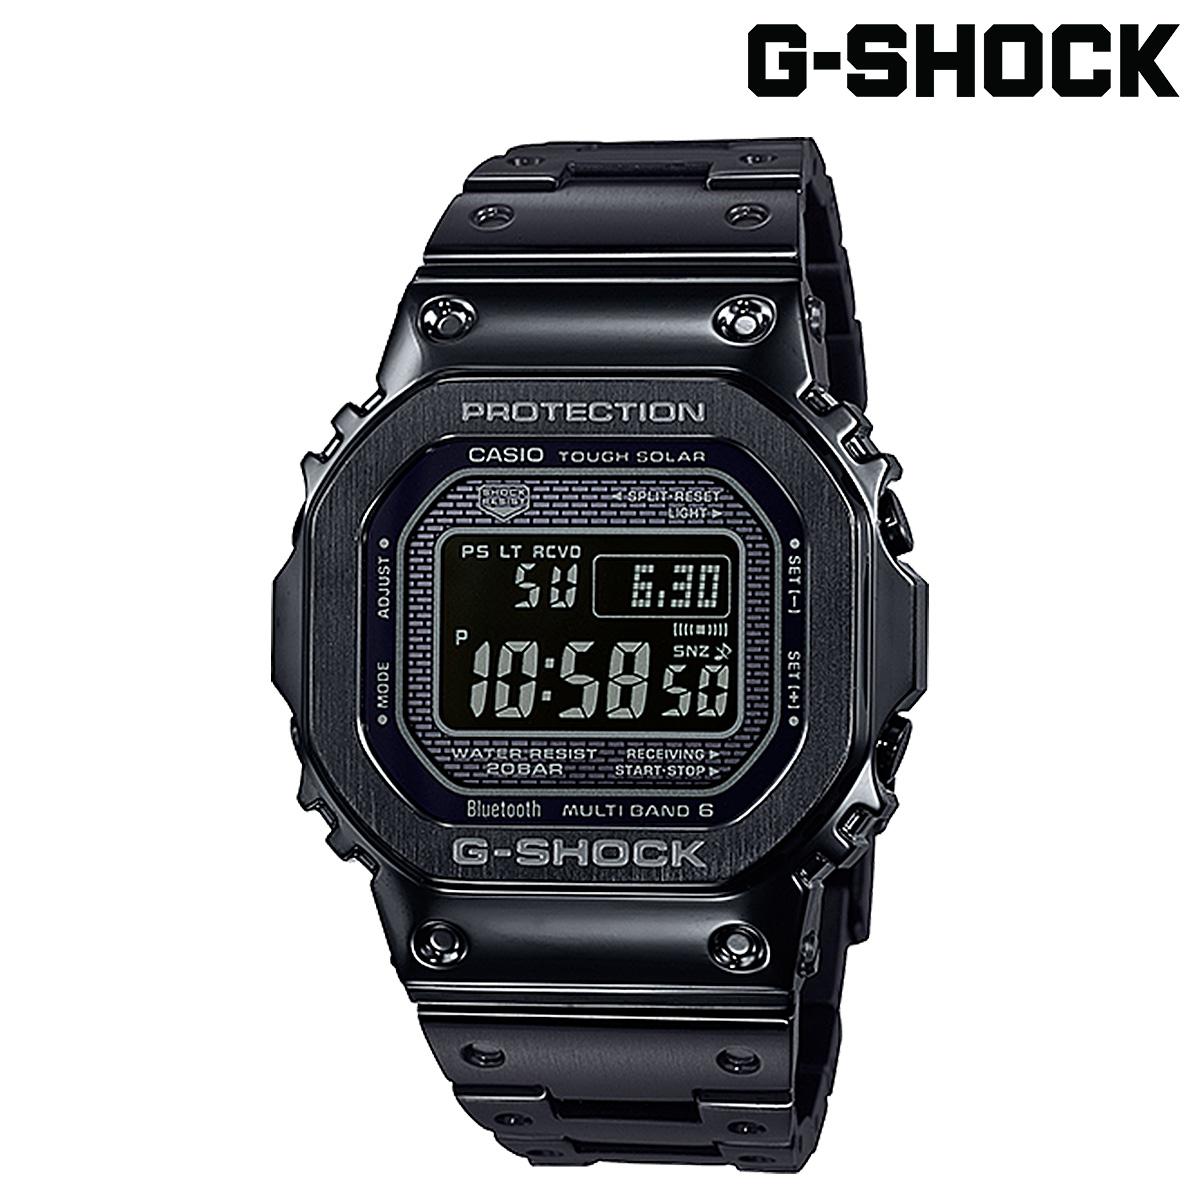 【SOLD OUT】 カシオ CASIO G-SHOCK 腕時計 GMW-B5000GD-1JF bluetooth ORIGIN ブラック メンズ レディース [10/3 新入荷]